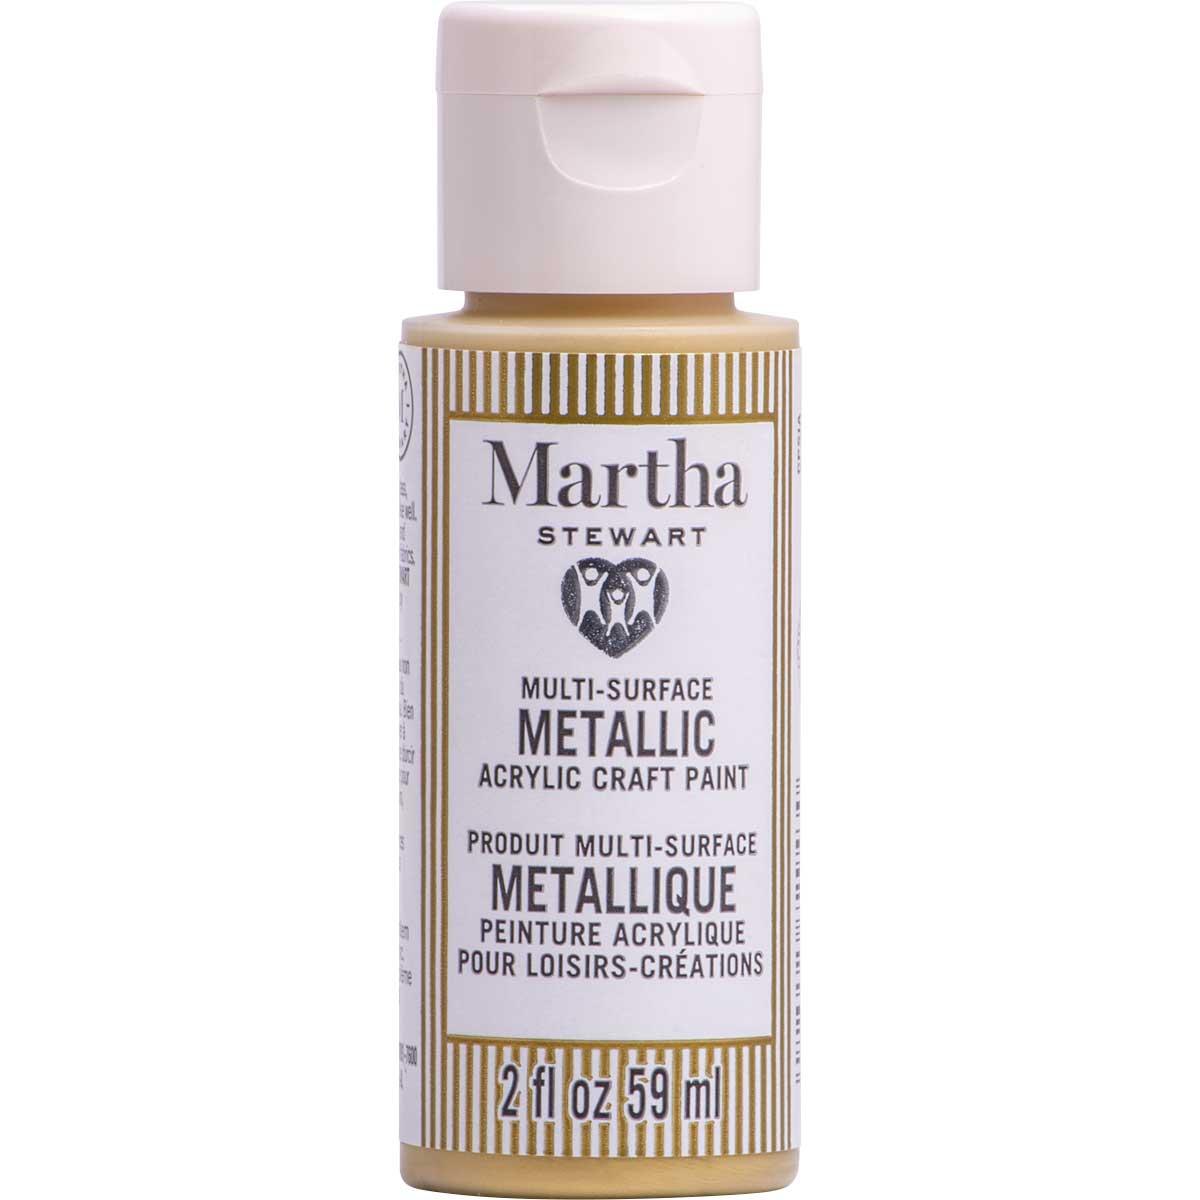 Martha Stewart® 2oz Multi-Surface Metallic Acrylic Craft Paint - Royal Gold